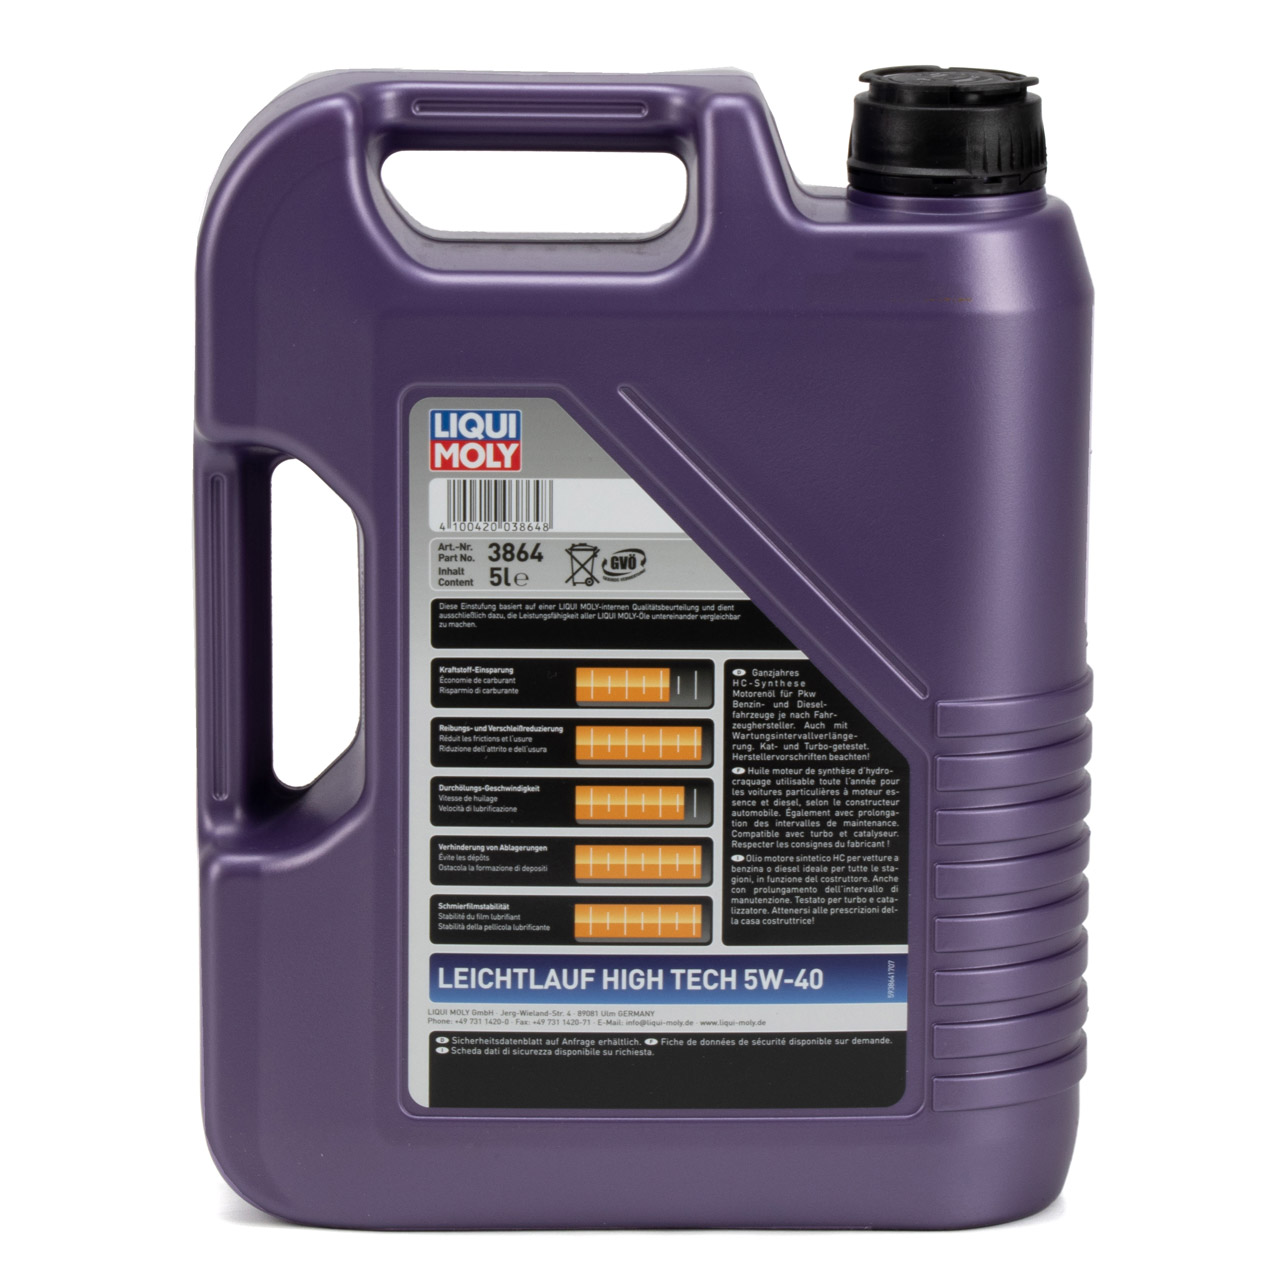 LIQUI MOLY Motoröl Öl Leichtlauf HIGH TECH 5W40 BMW LL-01 MB 229.5 - 5L 5 Liter